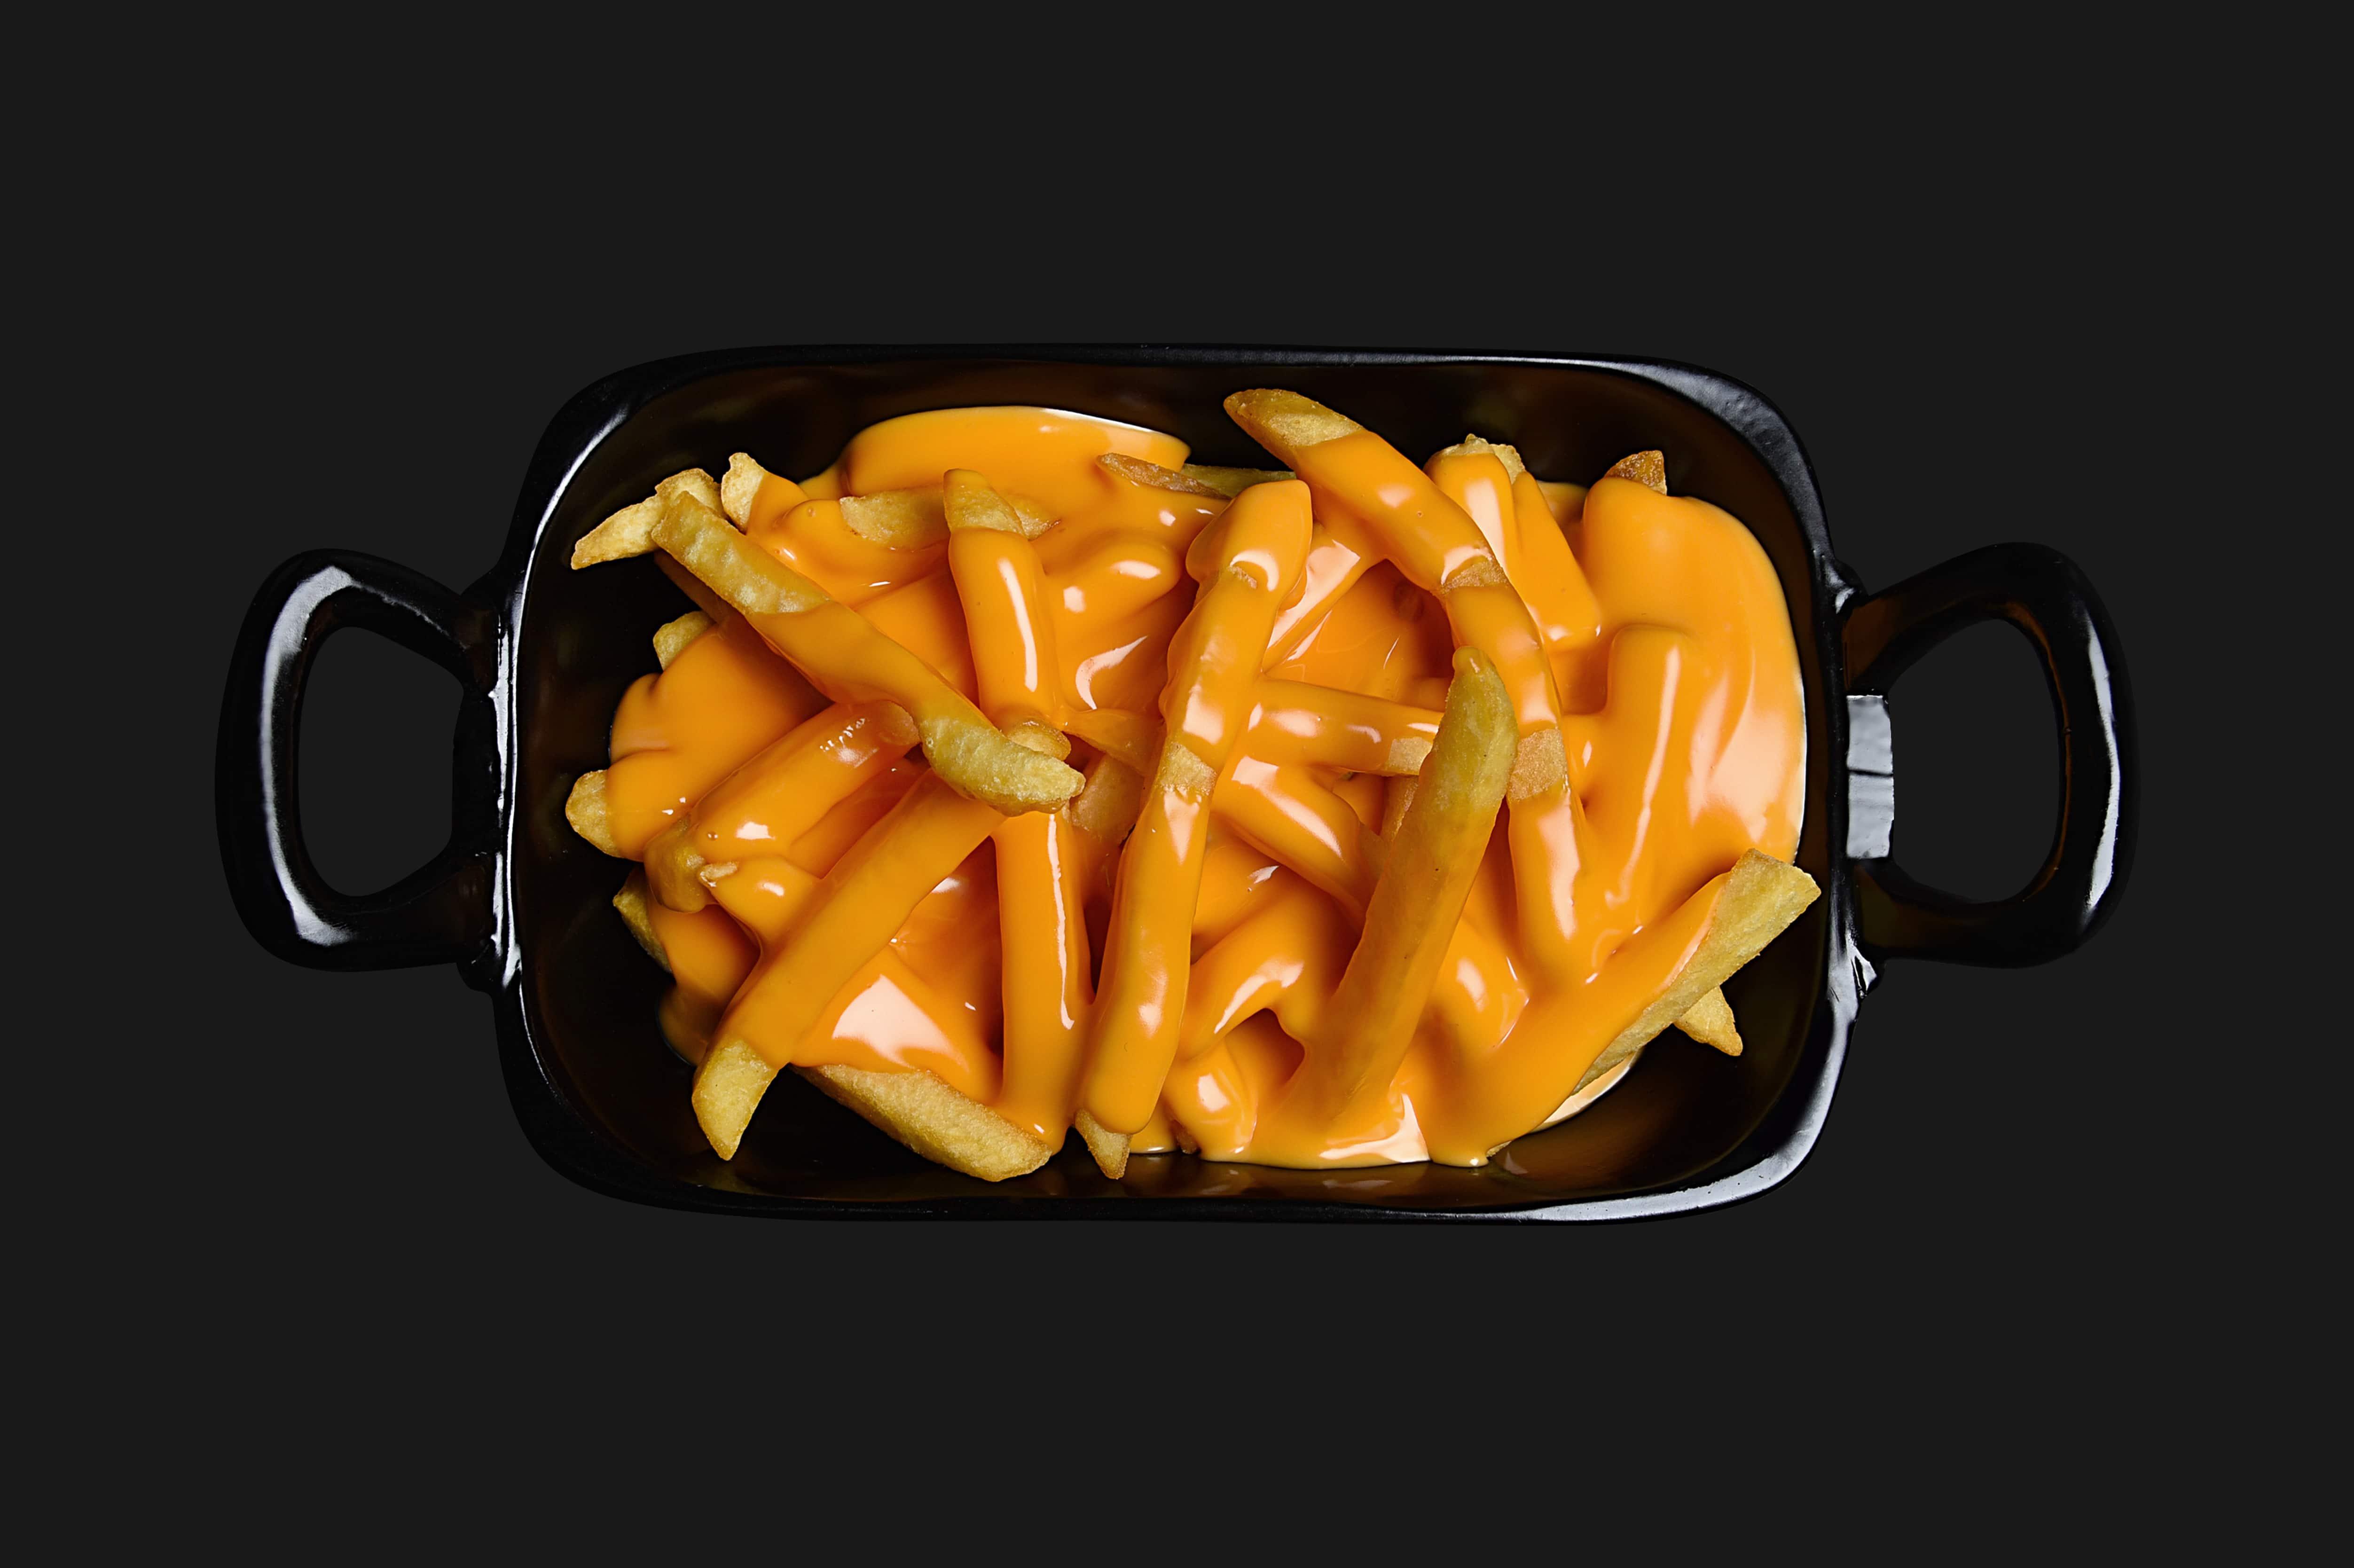 Cheesy sauce